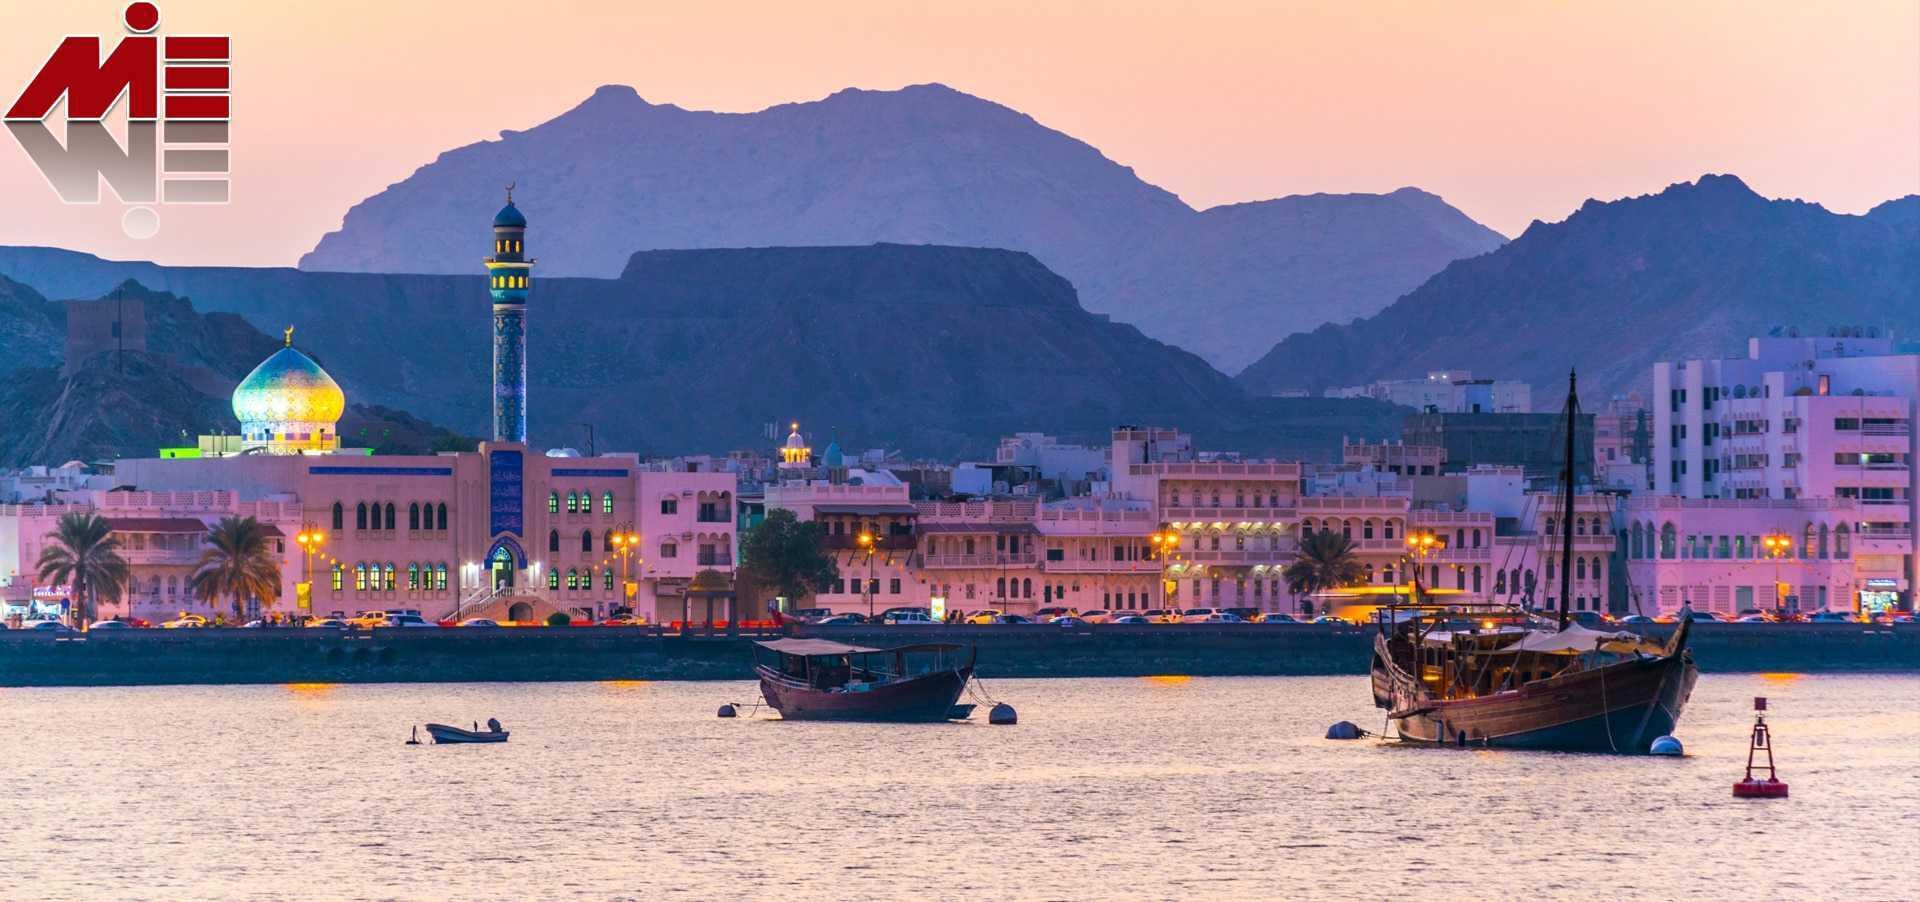 7c599 slide اقامت از طریق کار در عمان